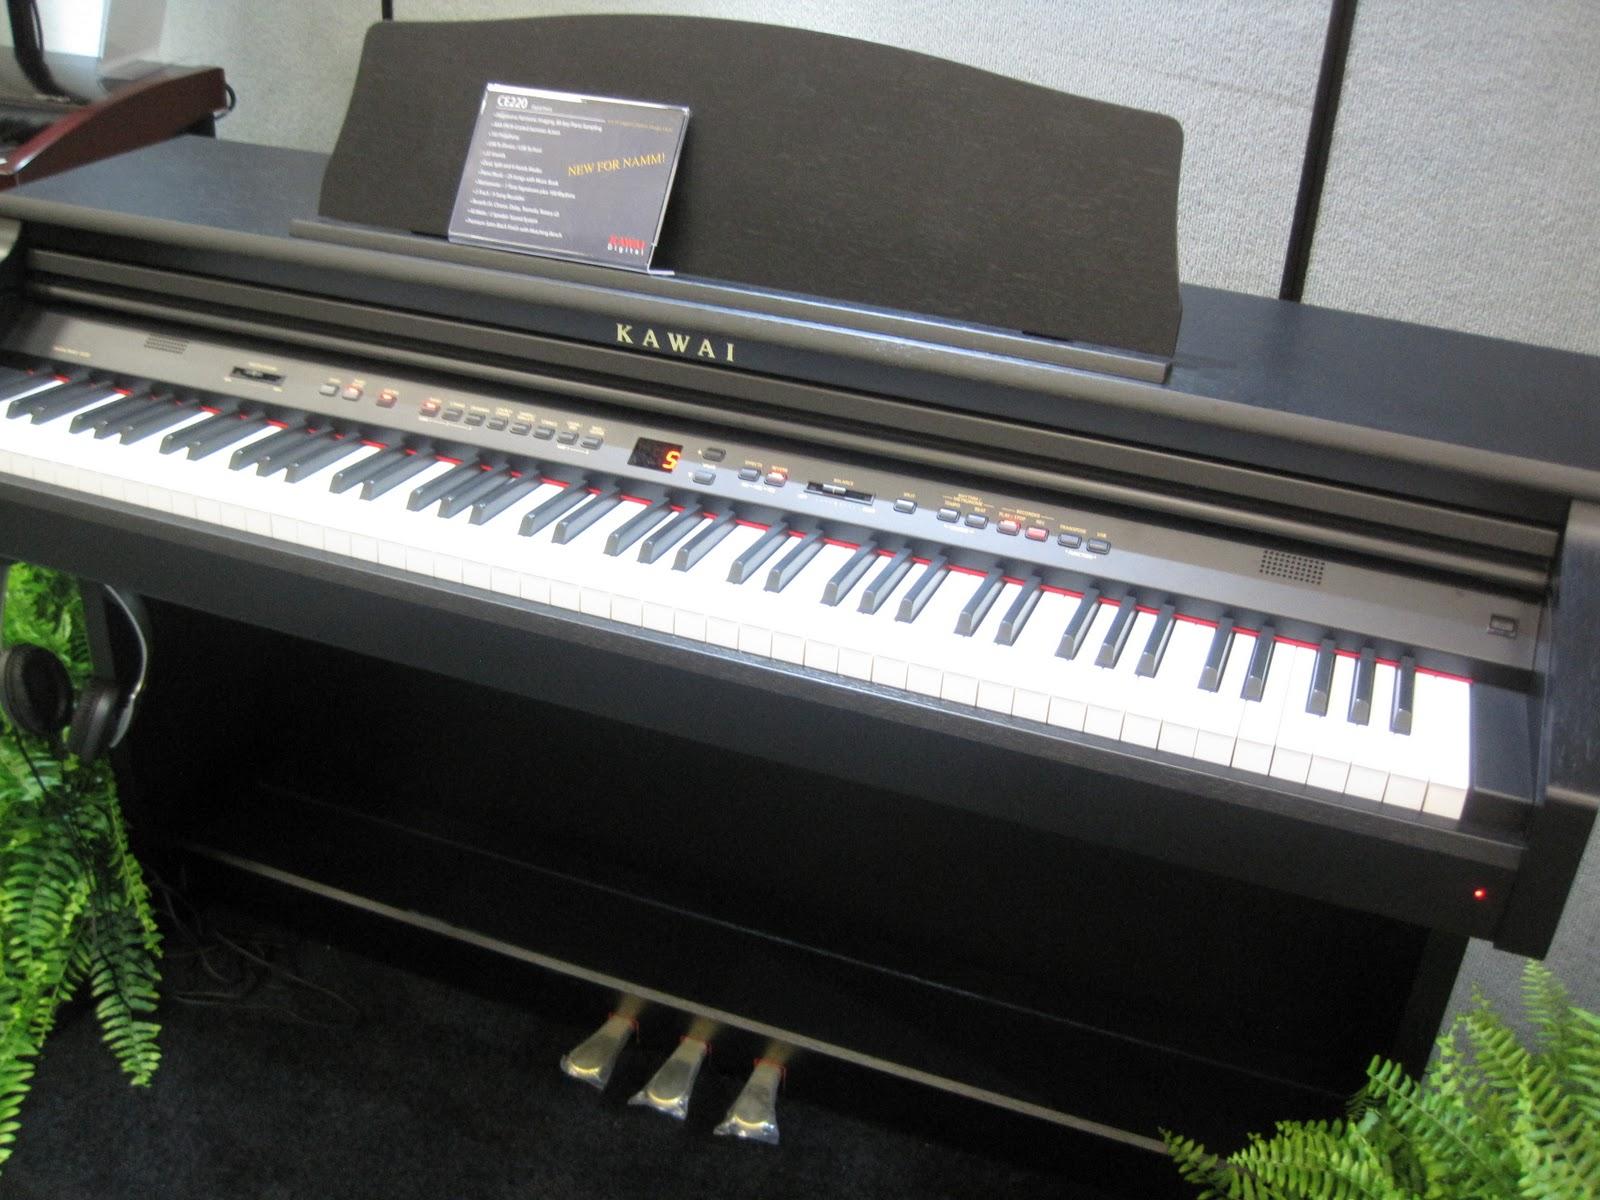 Kawai Digital Piano Parts : az piano reviews review kawai ce220 digital piano recommended digital piano reviews ~ Vivirlamusica.com Haus und Dekorationen